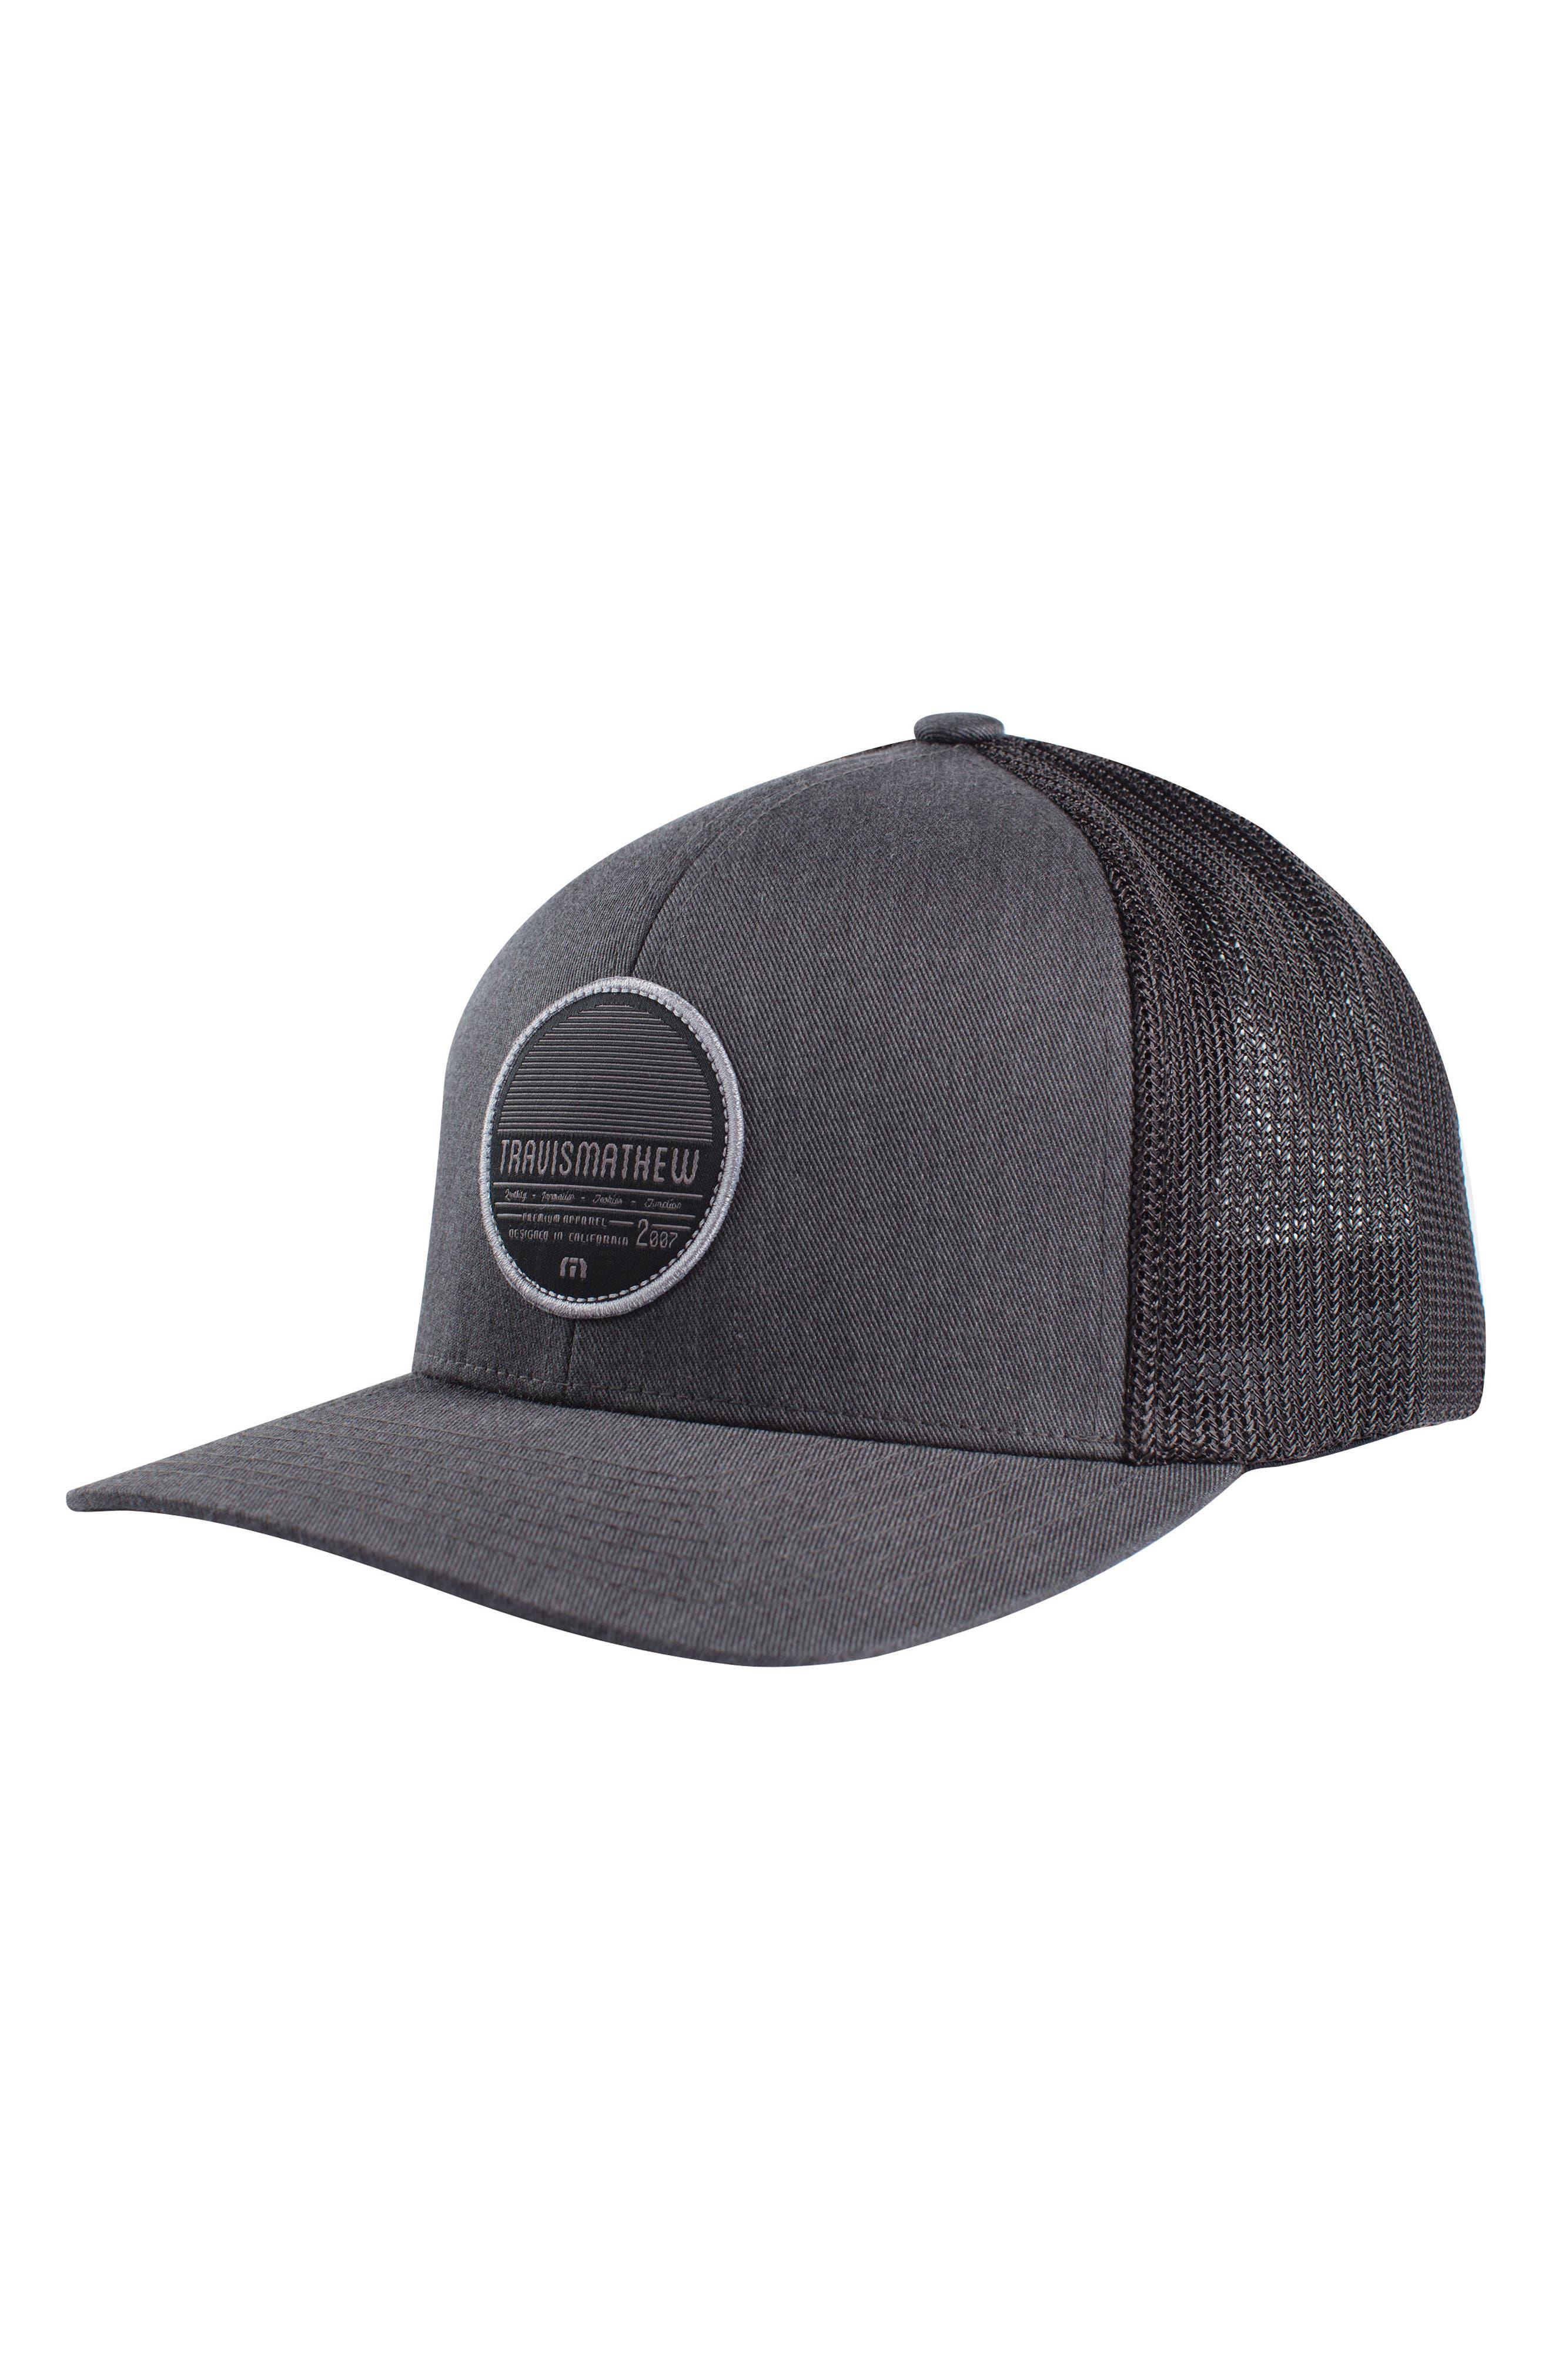 huge discount 8f944 07db1 ... coupon travis mathew ripper trucker hat eeabe 32716